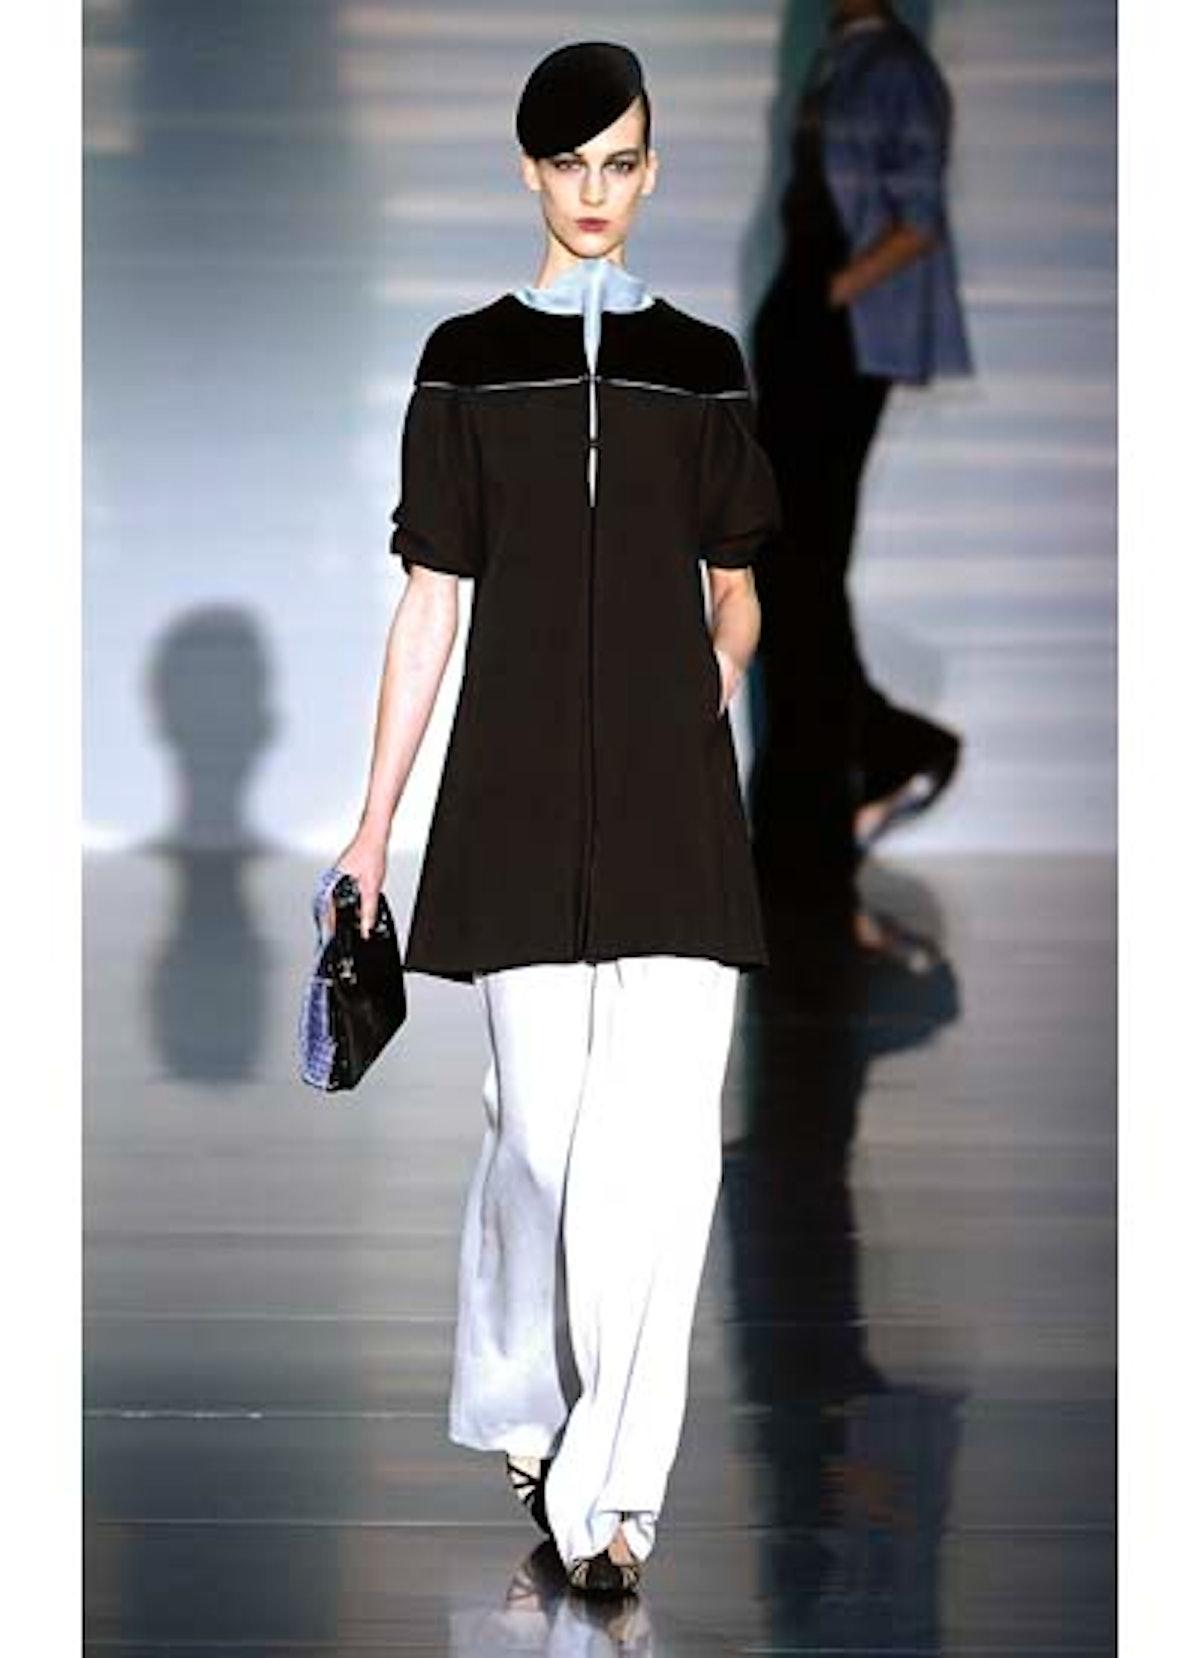 fass-giorgio-armani-couture-2012-runway-01-v.jpg